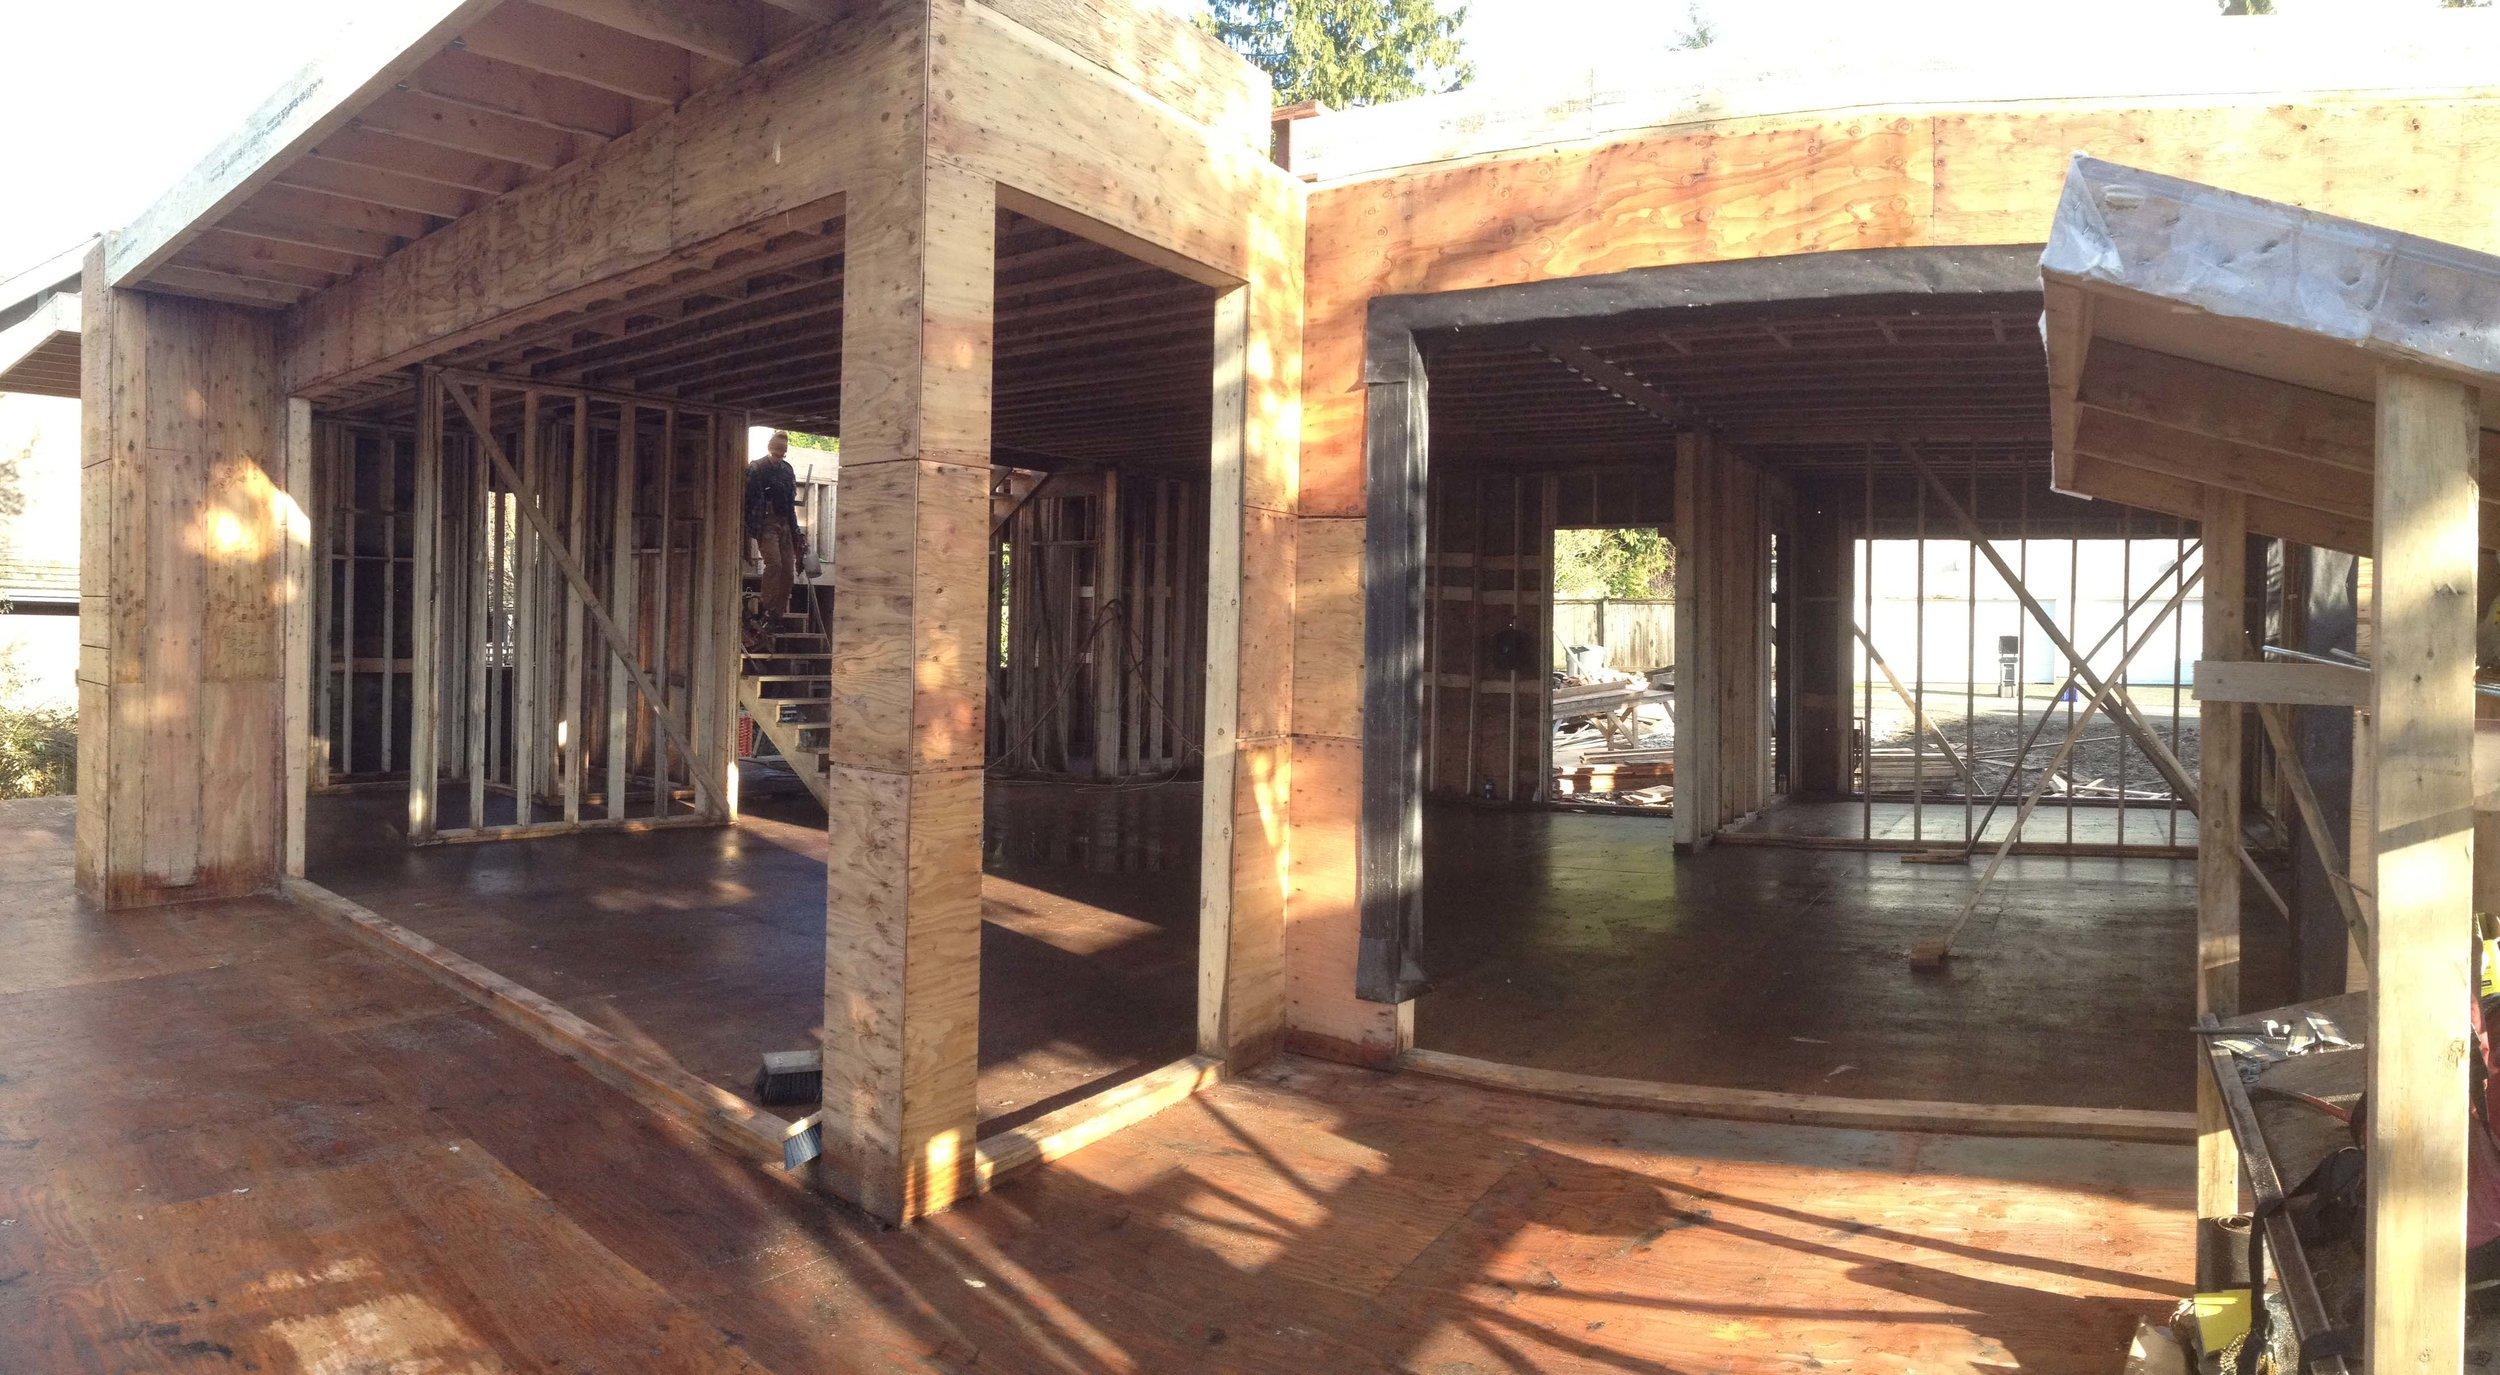 Postle_Construction_WoodFraming29.jpg